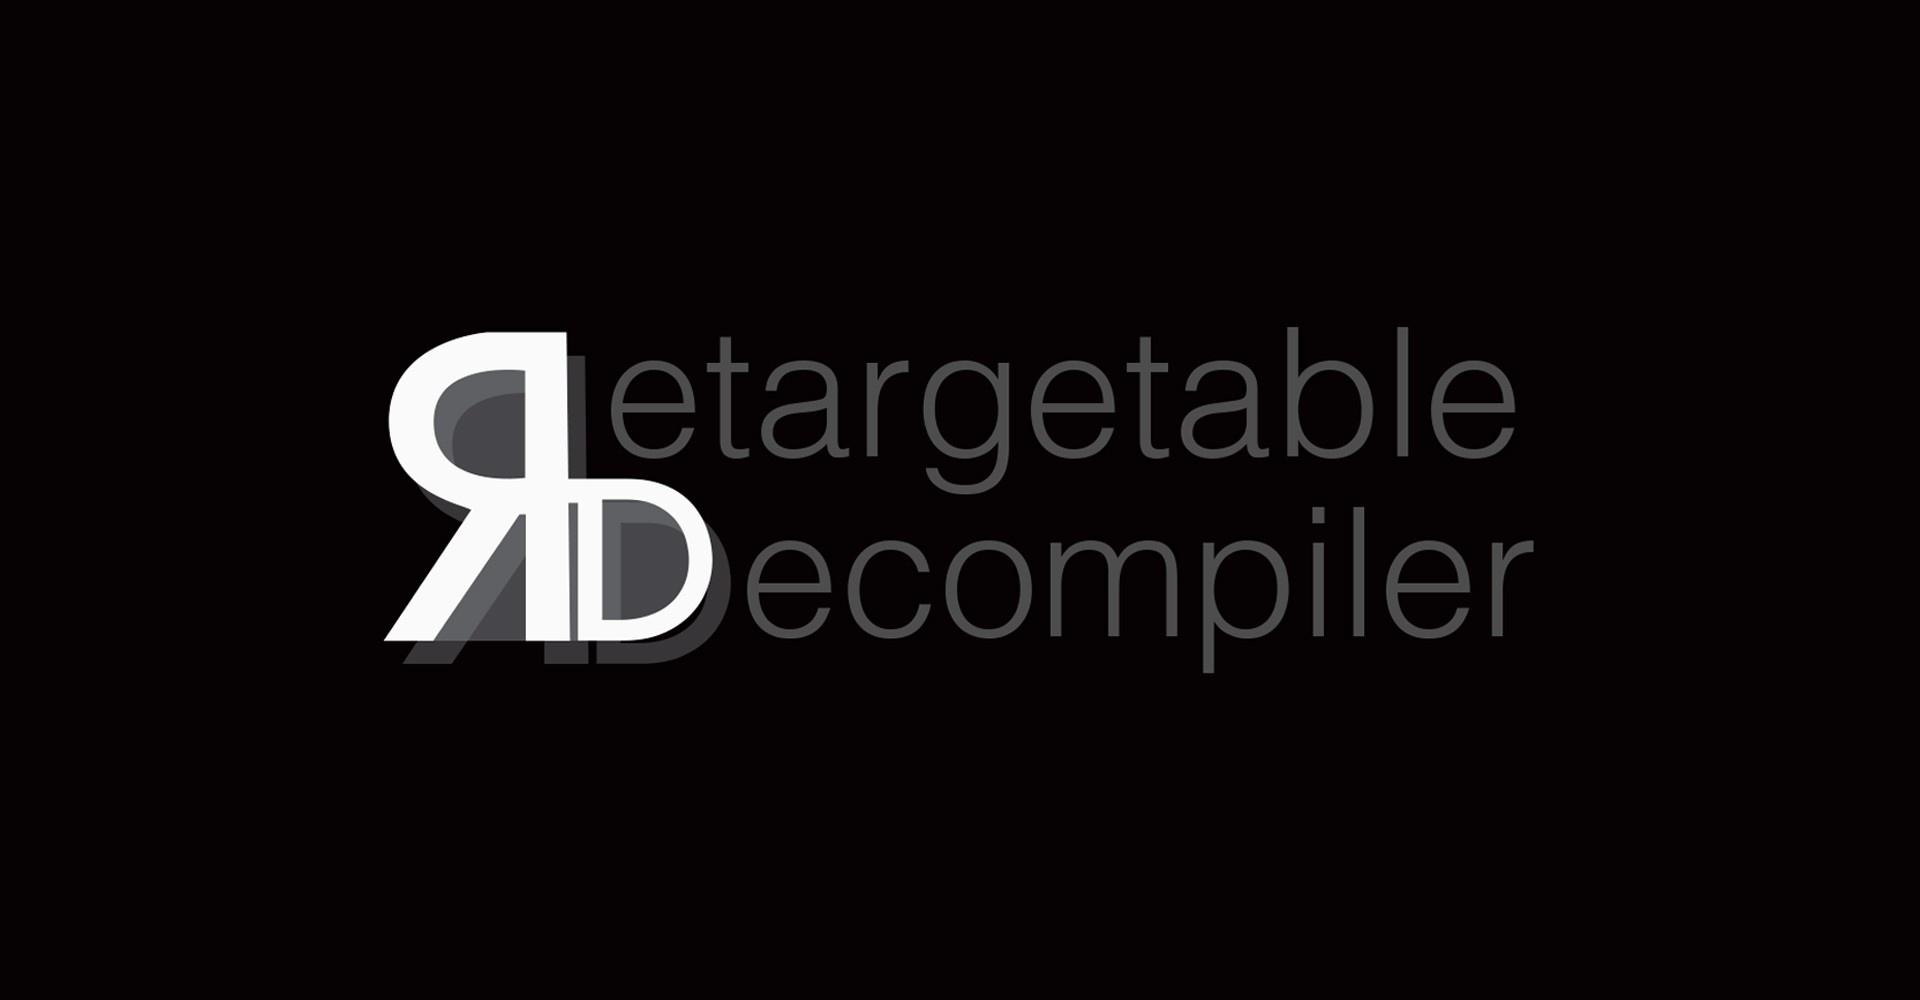 Avast_blog_retargetable_decompiler-1.jpg